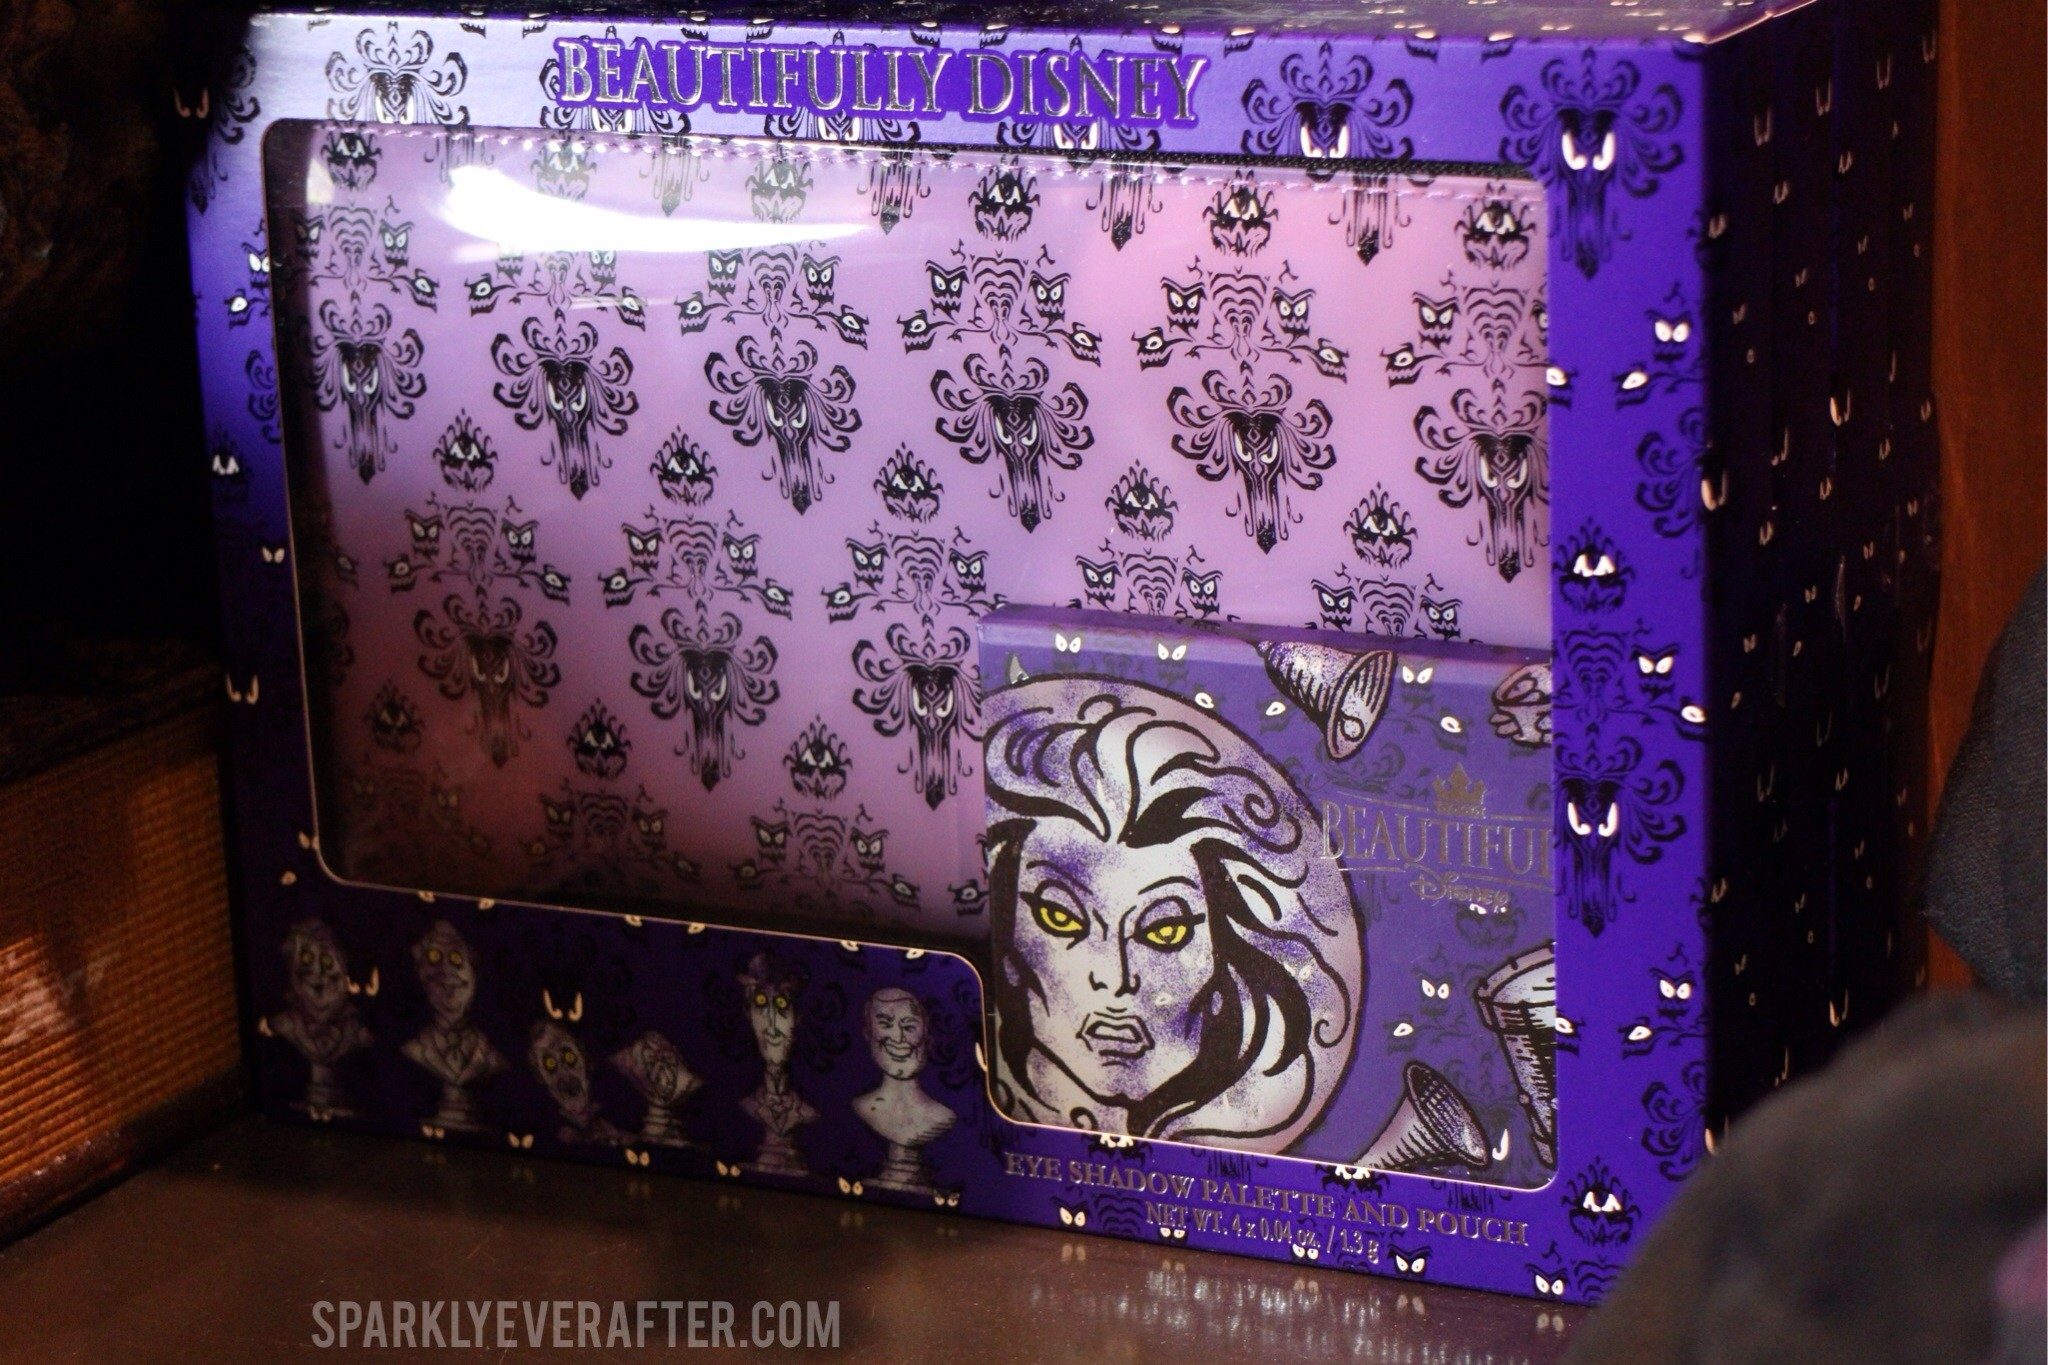 Haunted Mansion Beautifully Disney